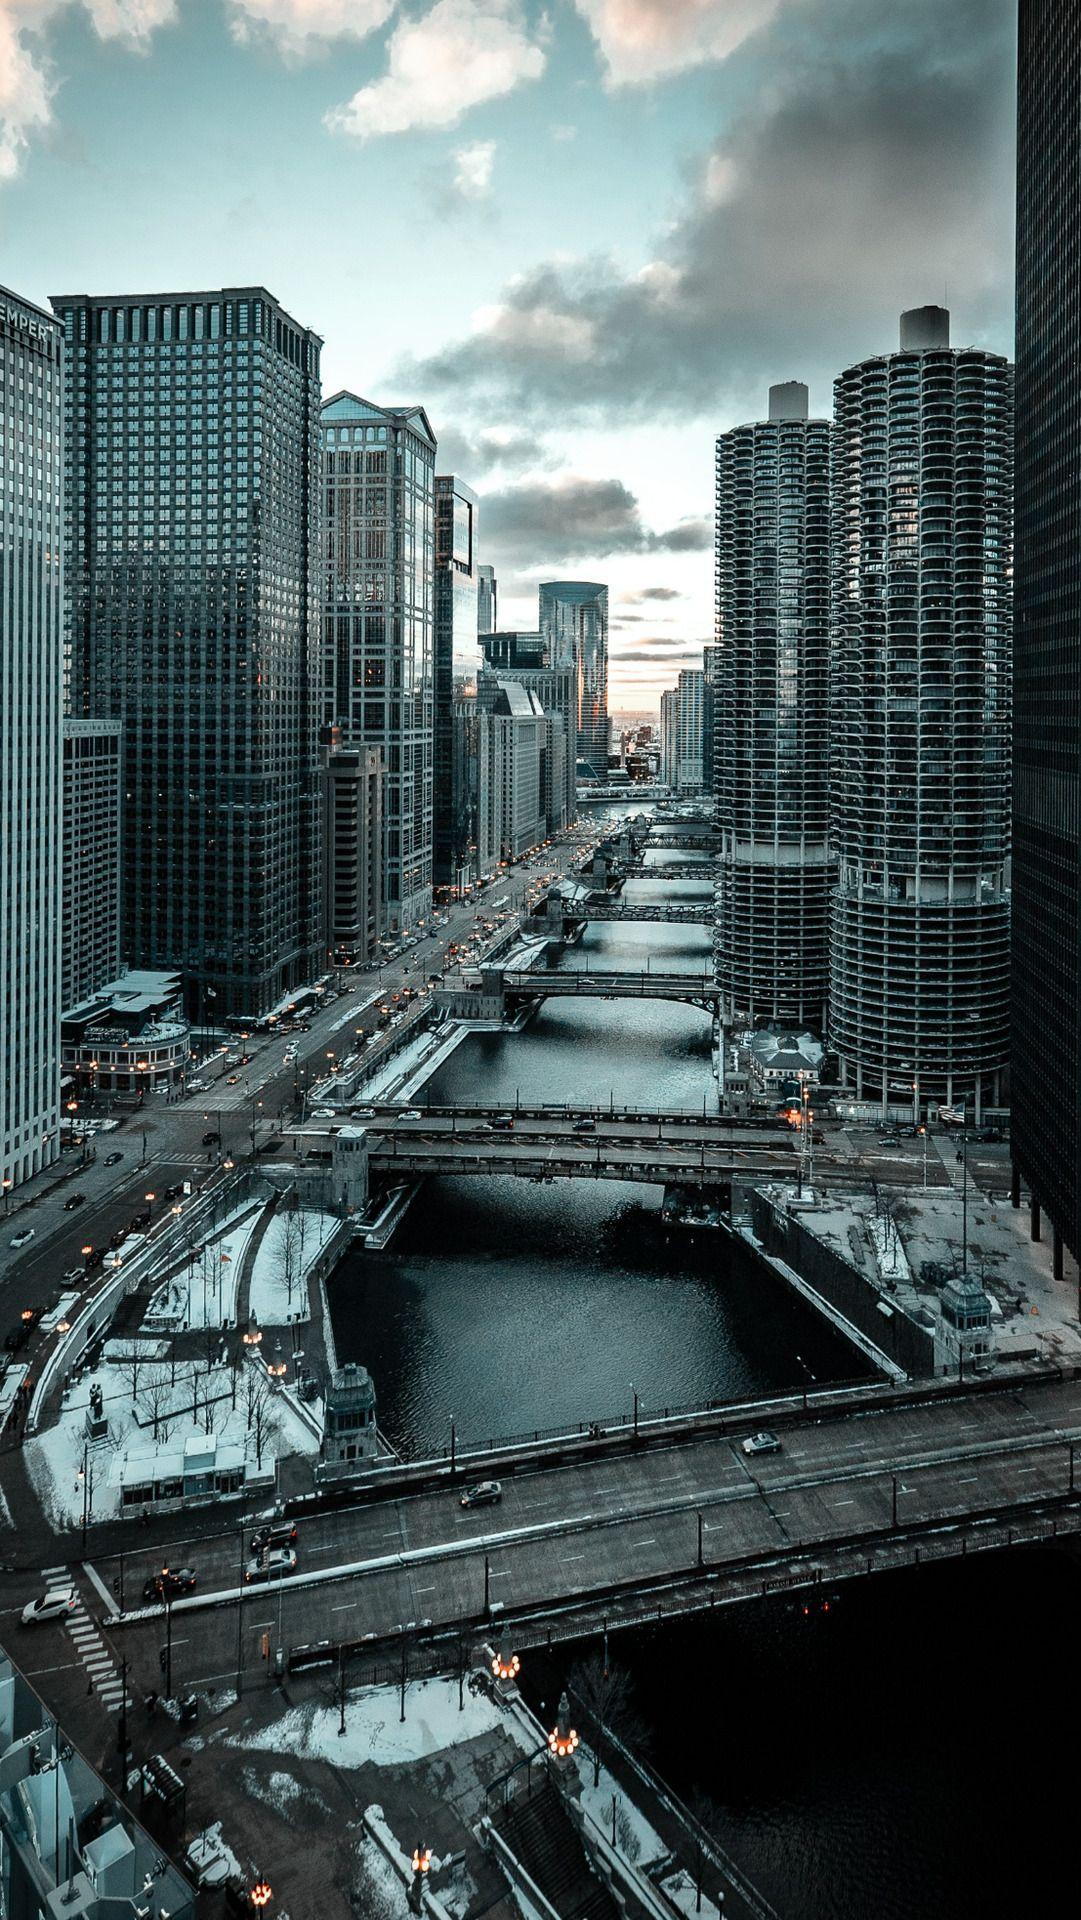 Https Locksxcreenxs Tumblr Com Post 184925957803 Chicago Aesthetic City Wallpaper Chicago Wallpaper